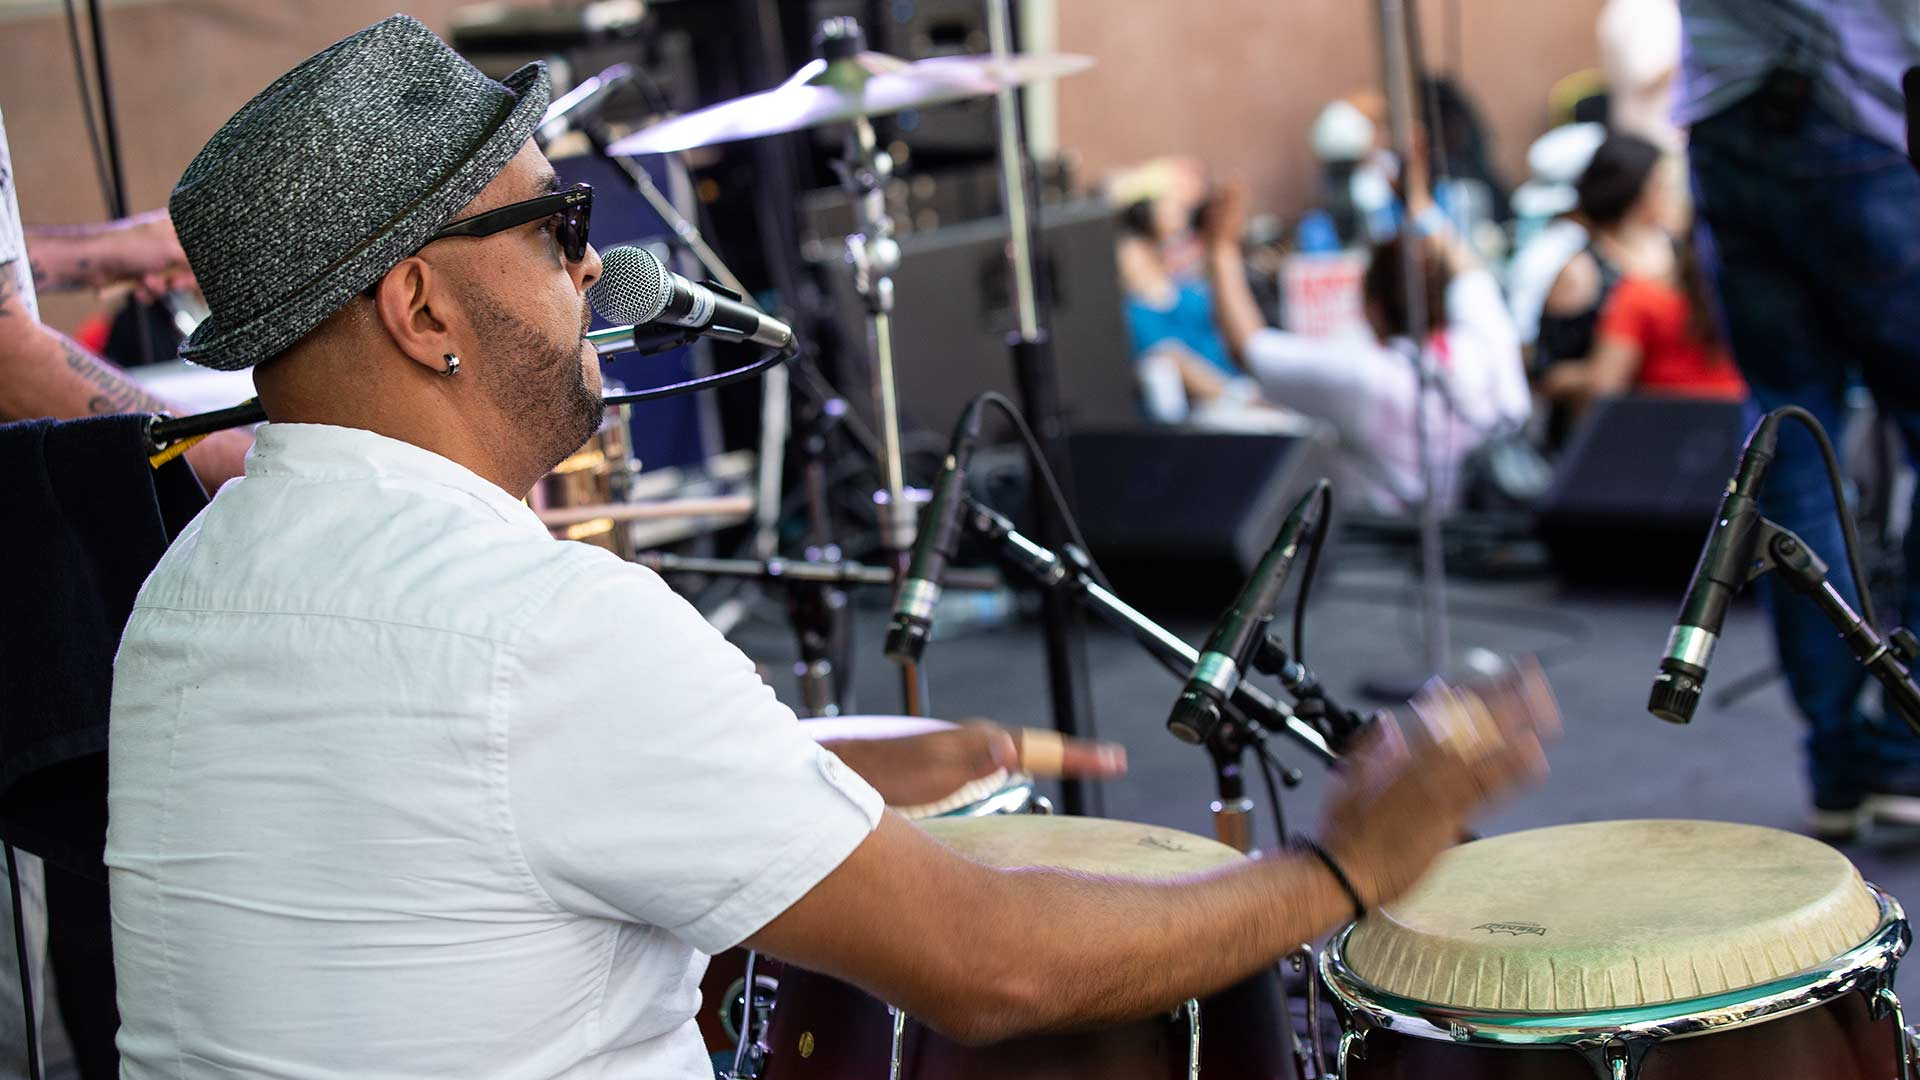 Omar percussion